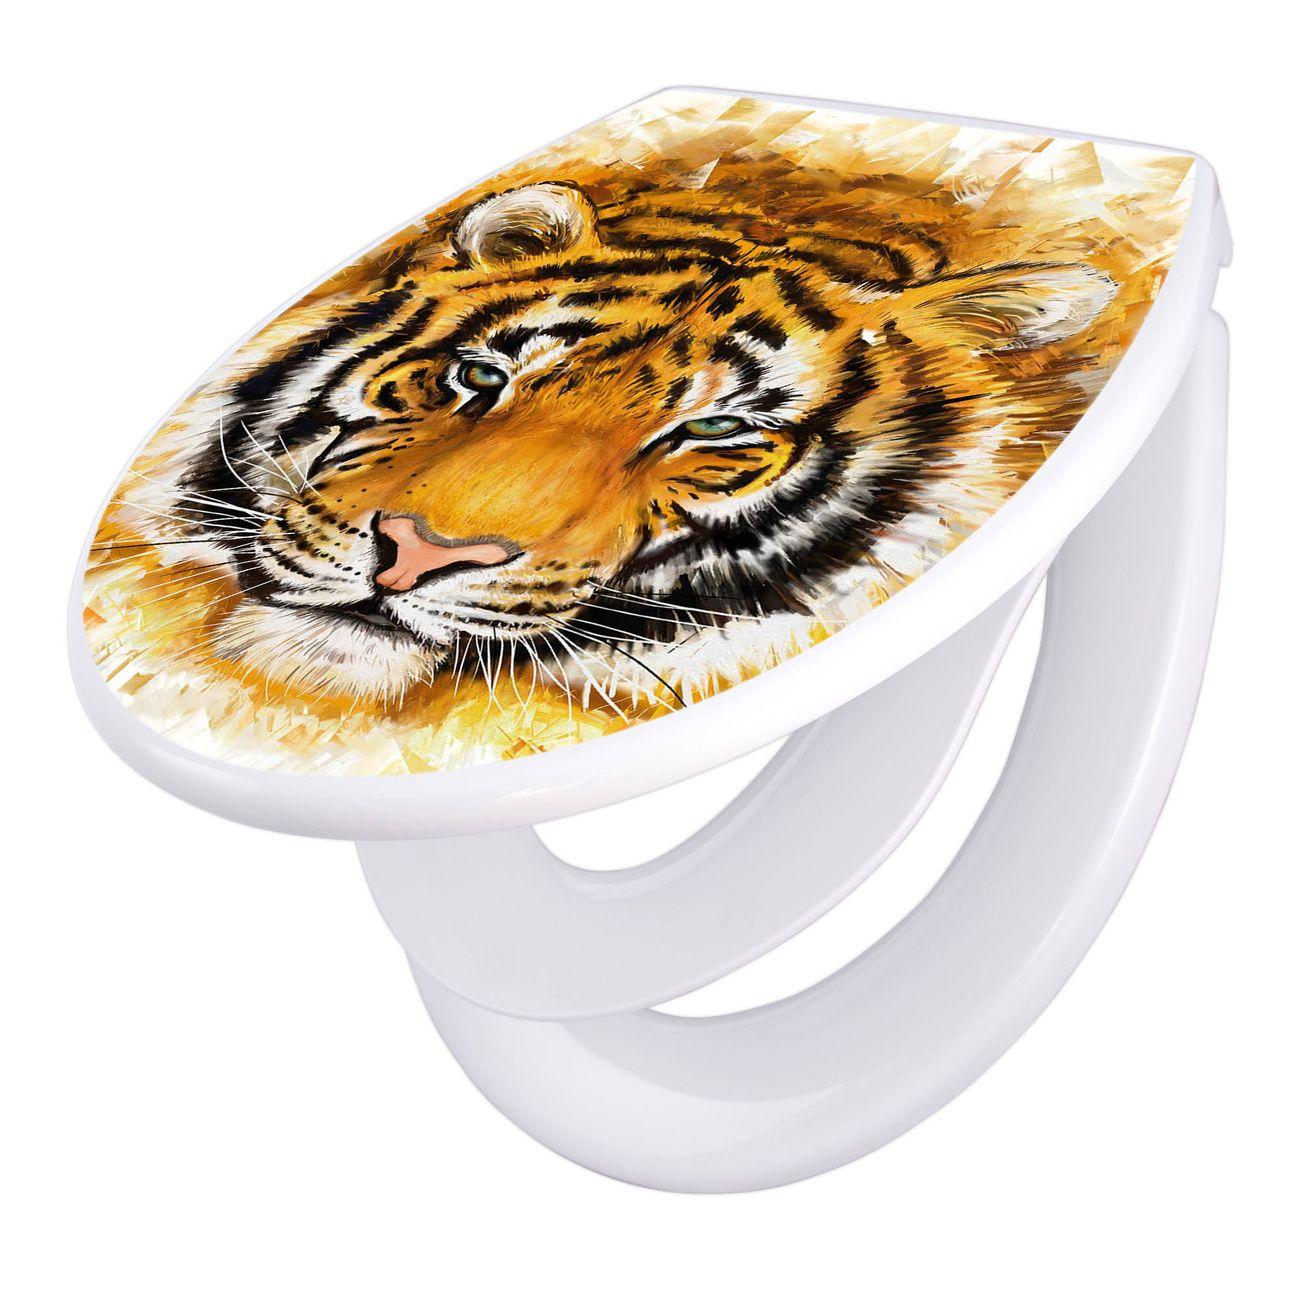 Toilettendeckel weiß mit Absenkautomatik Motiv Tigerkopf